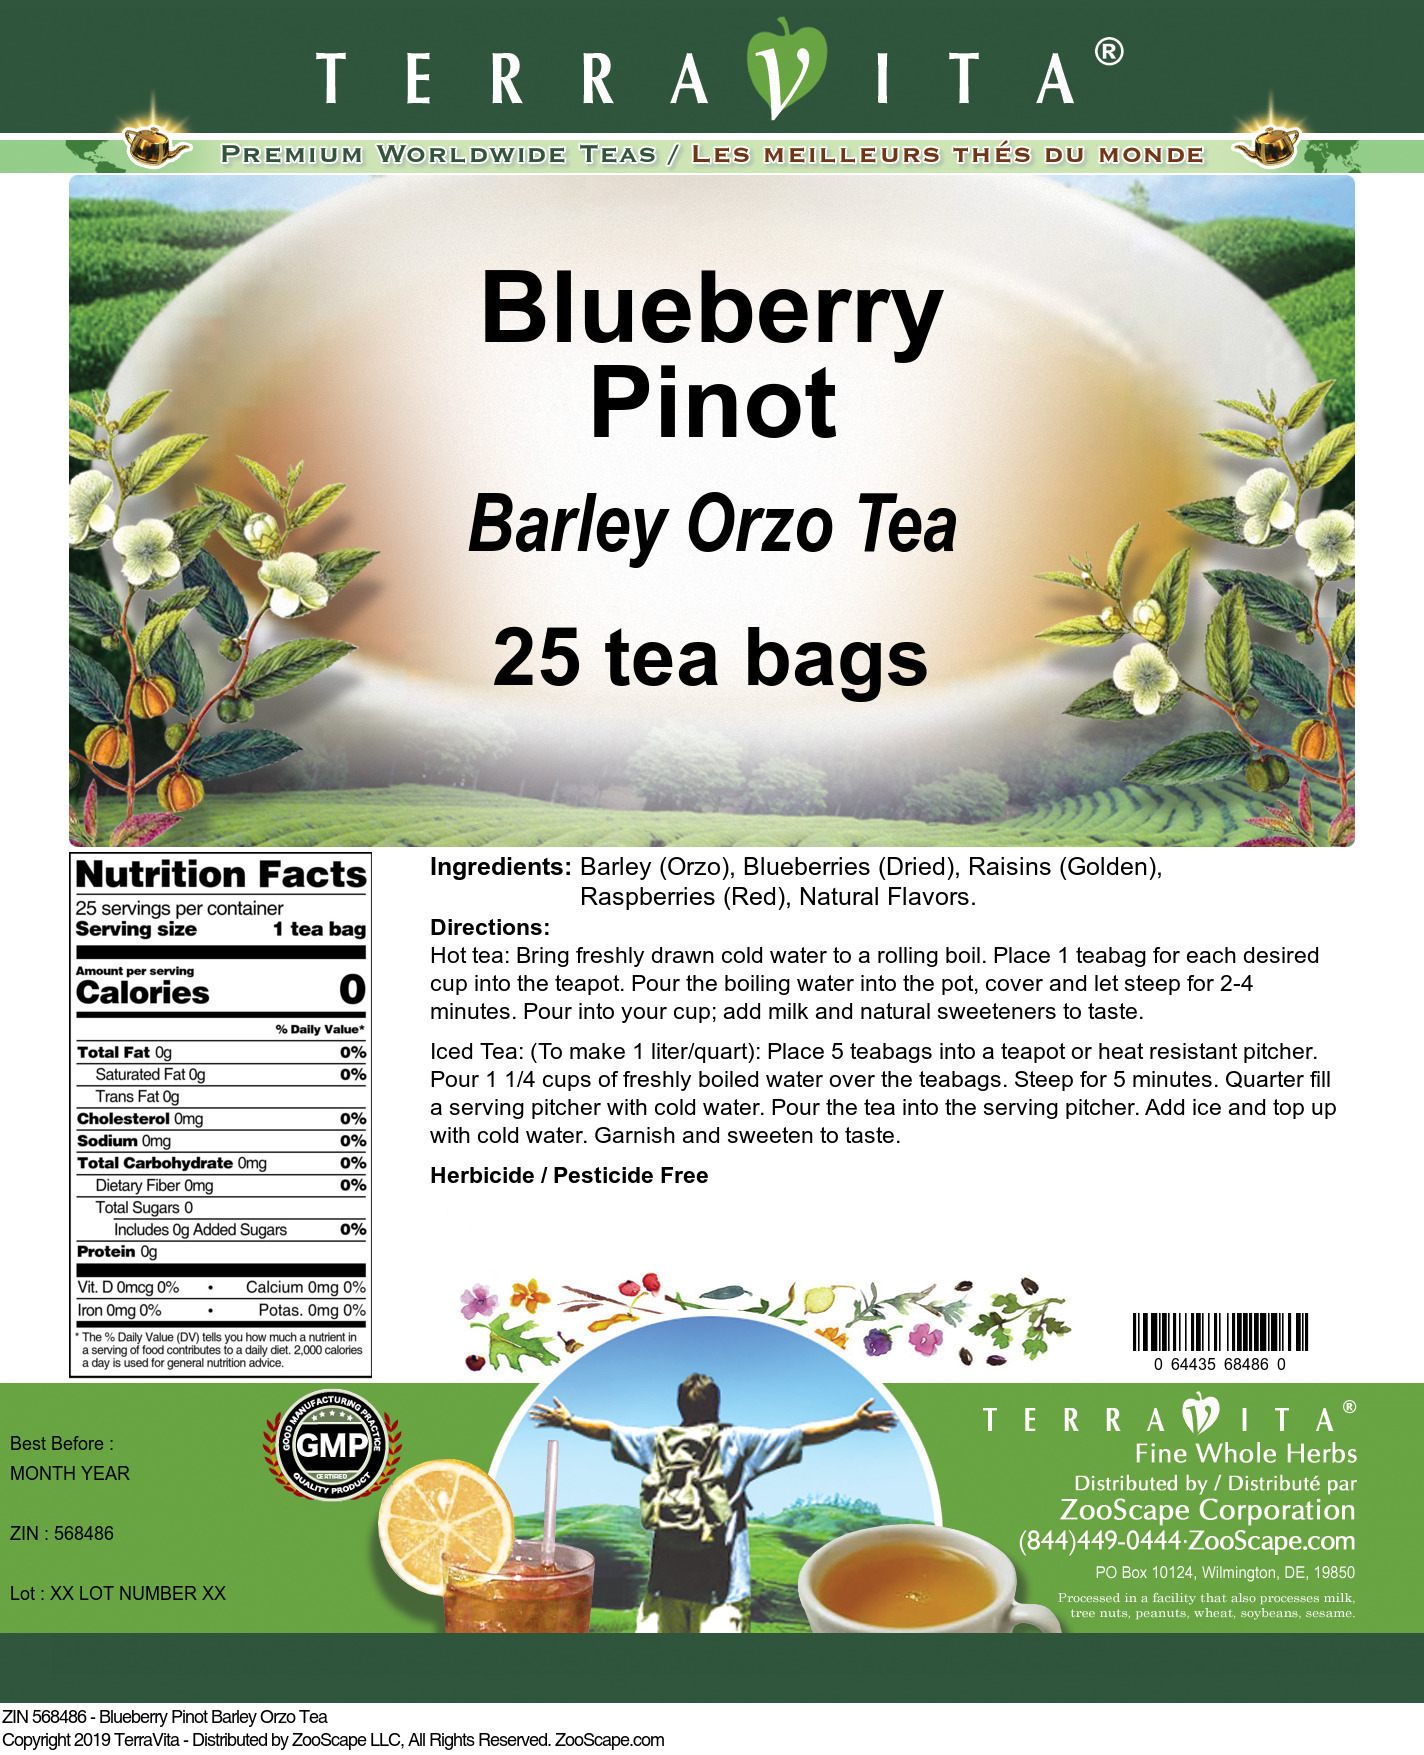 Blueberry Pinot Barley Orzo Tea